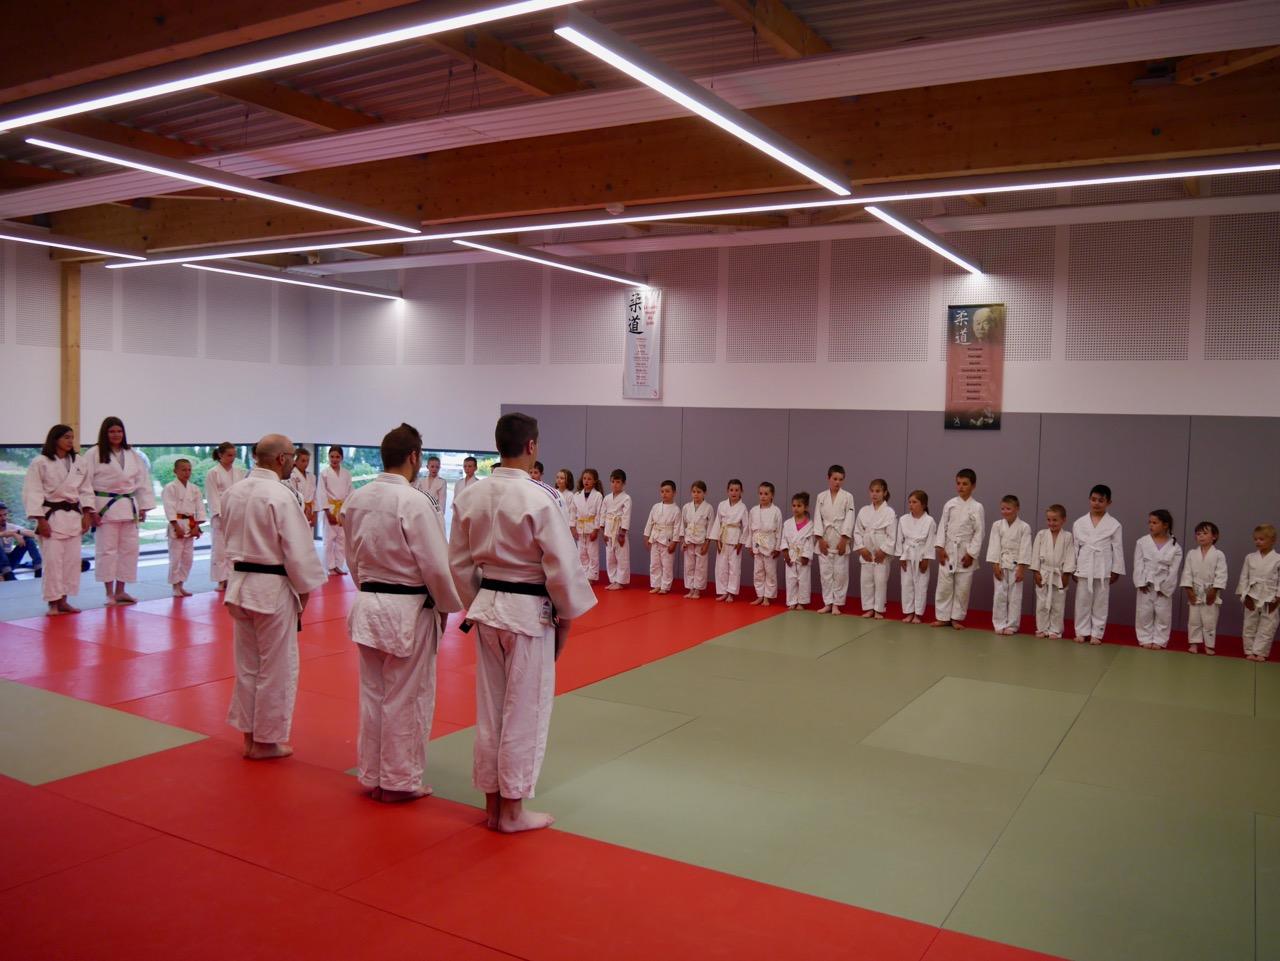 Portes Ouvertes Du Judo Club